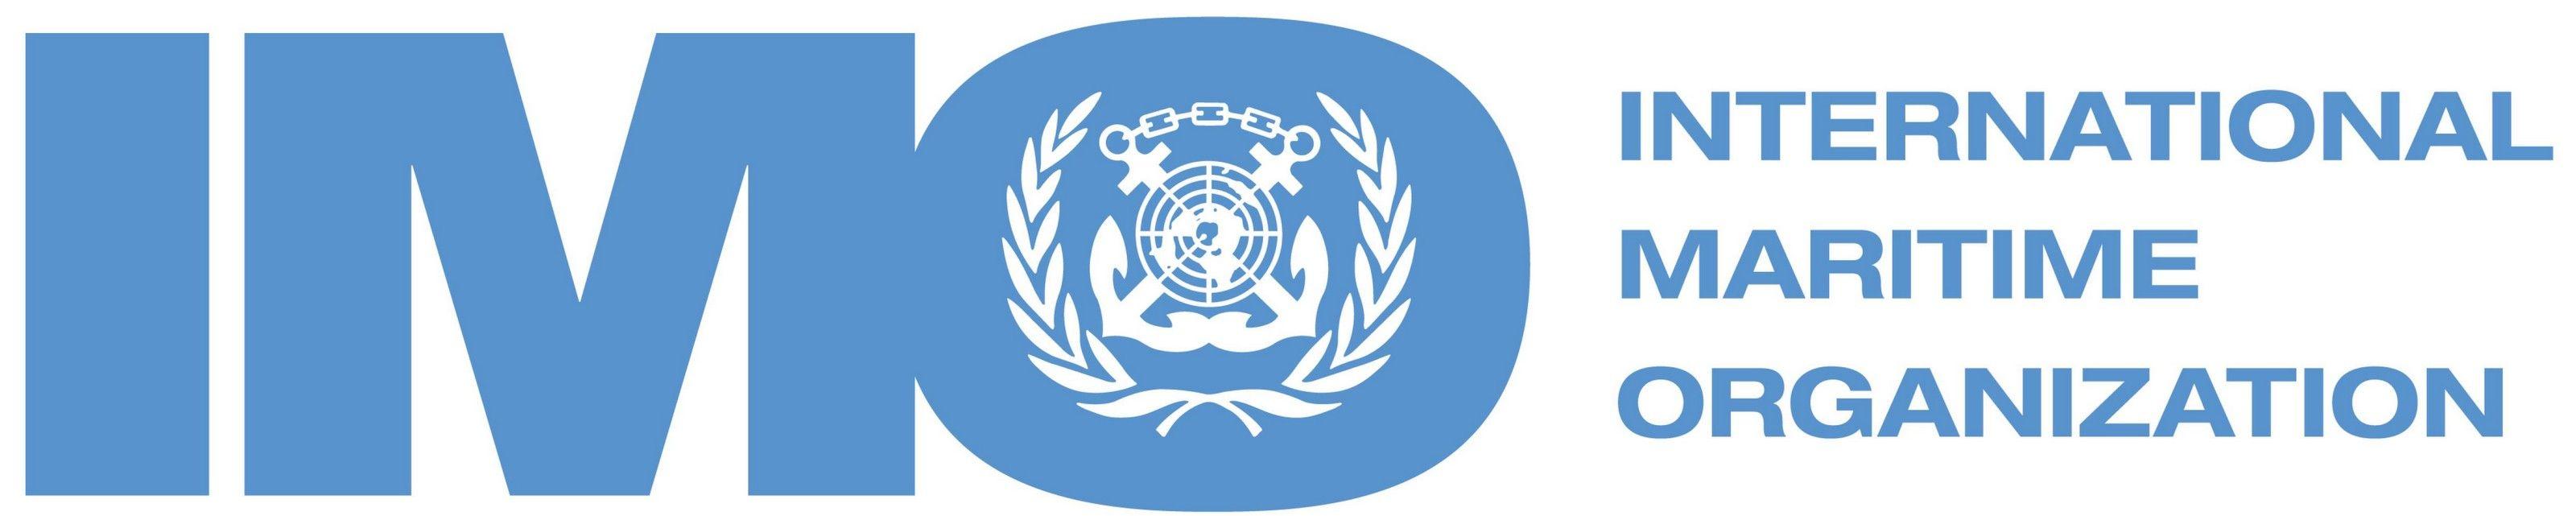 Best 25 international maritime organization ideas on pinterest best 25 international maritime organization ideas on pinterest international relations law and lawyers buycottarizona